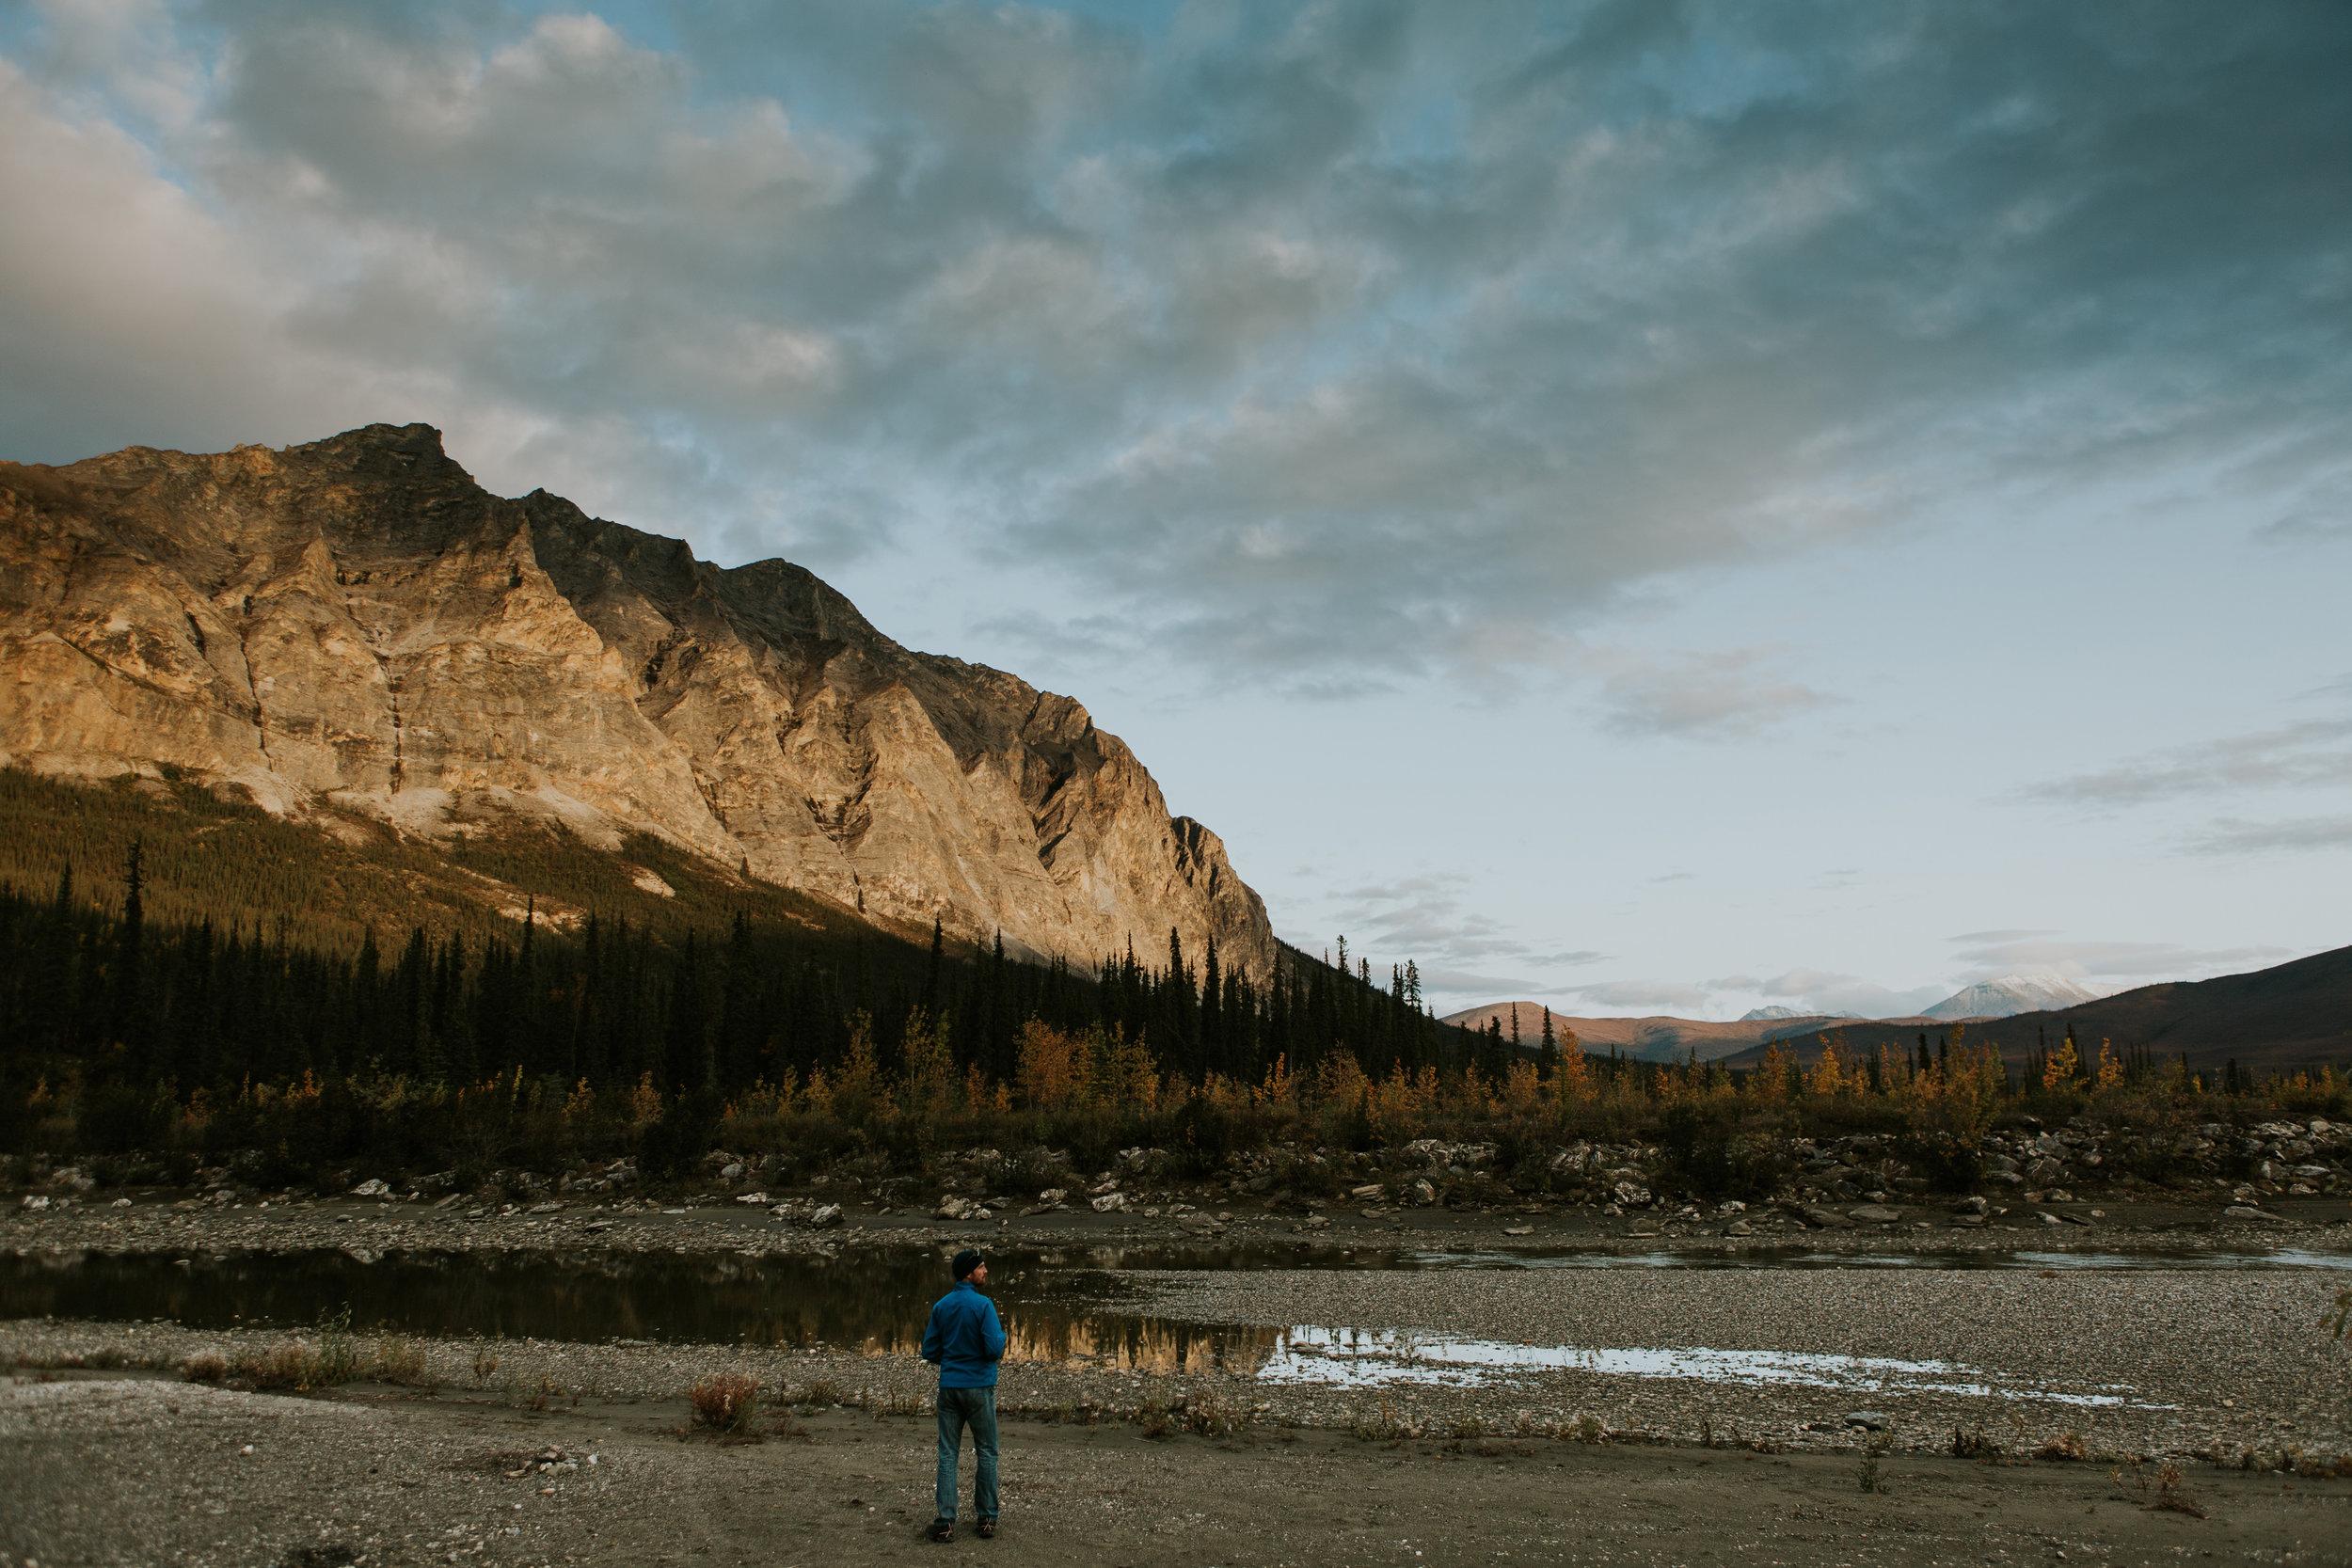 CindyGiovagnoli_Alaska_KoyukukRiver_SukakpakMountain_JimRiver_ArcticCircle_fly_fishing_September-009.jpg